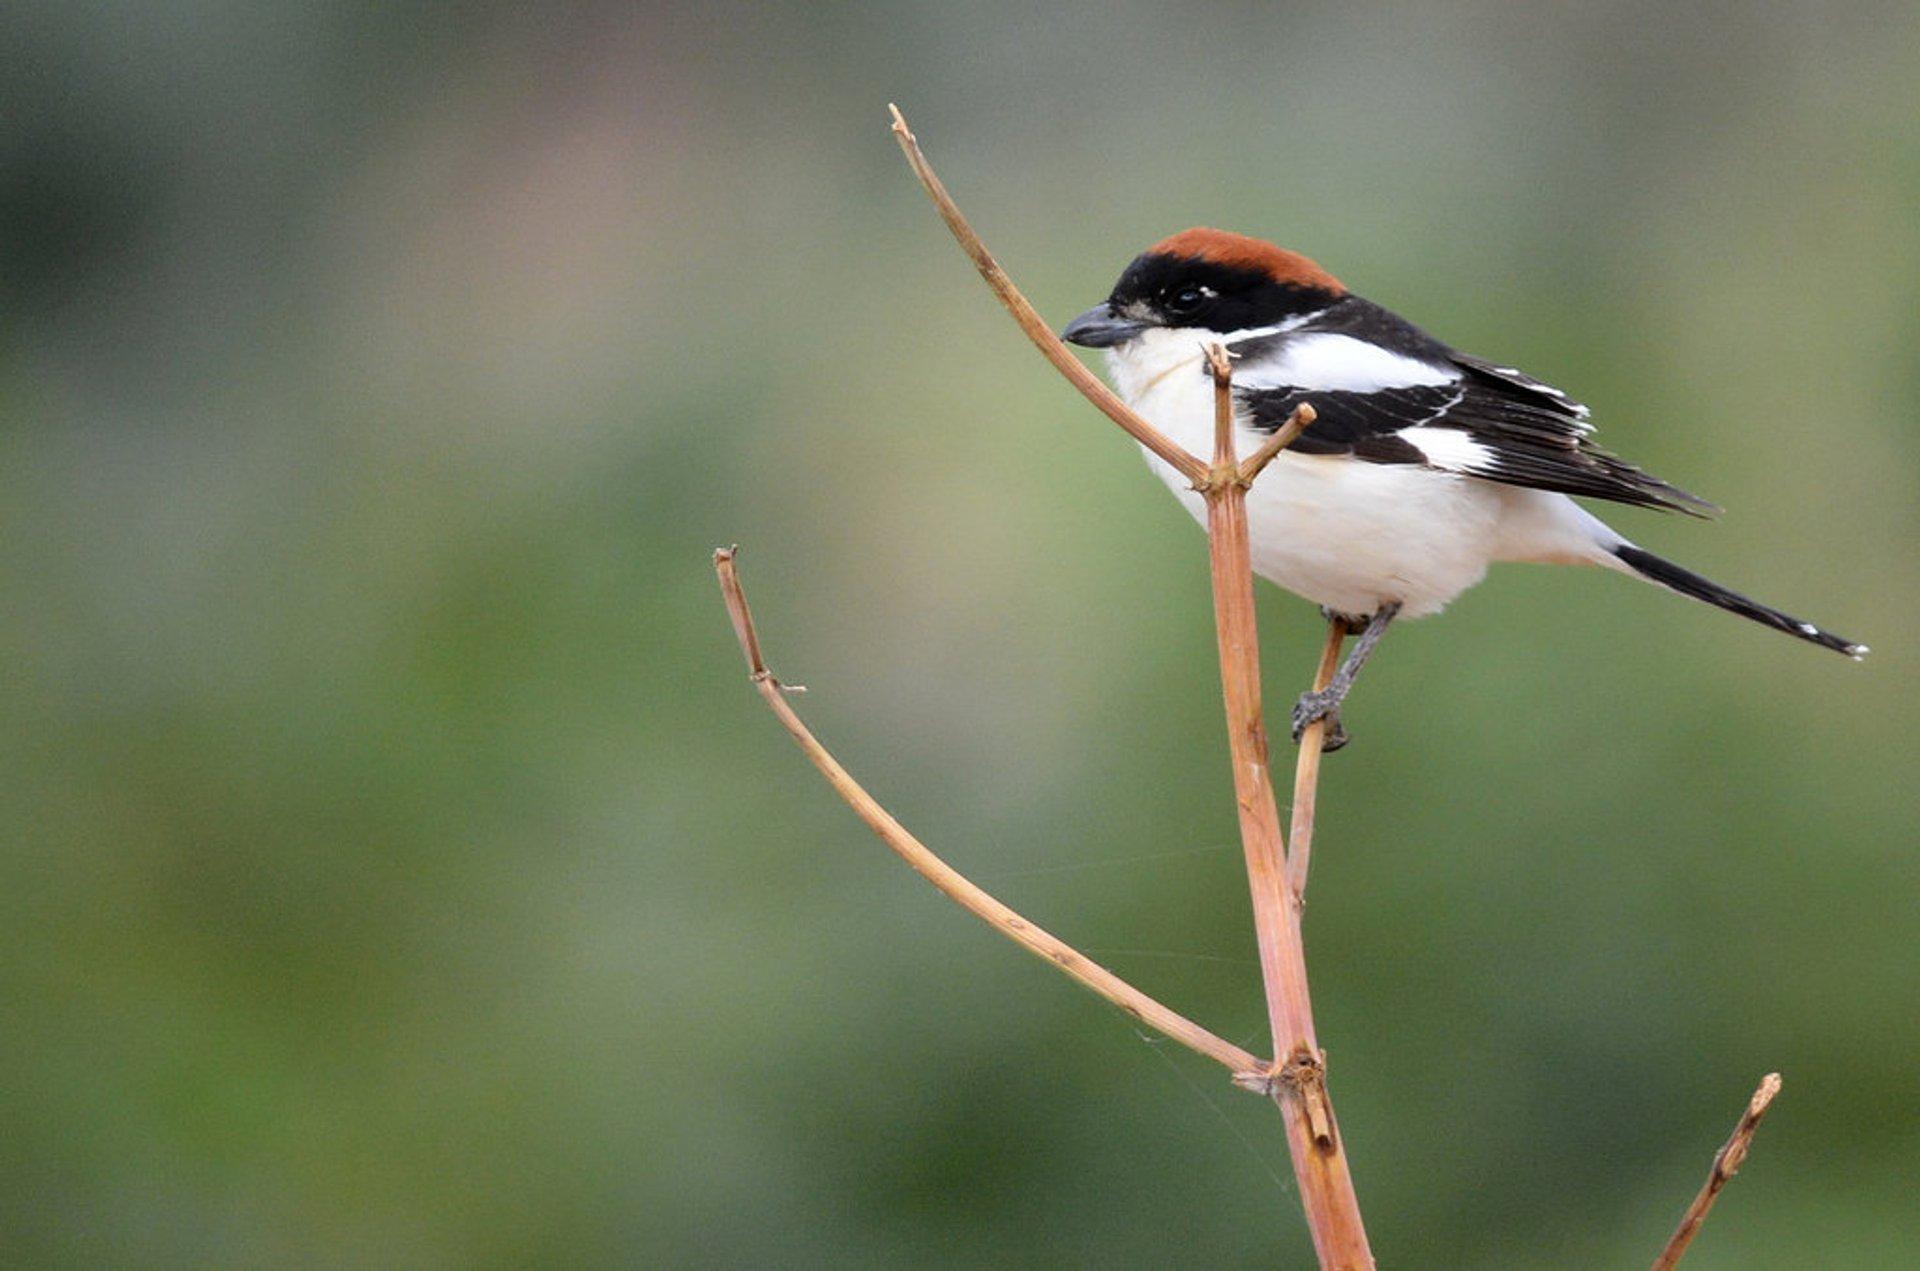 Birdwatching in Jordan 2019 - Best Time